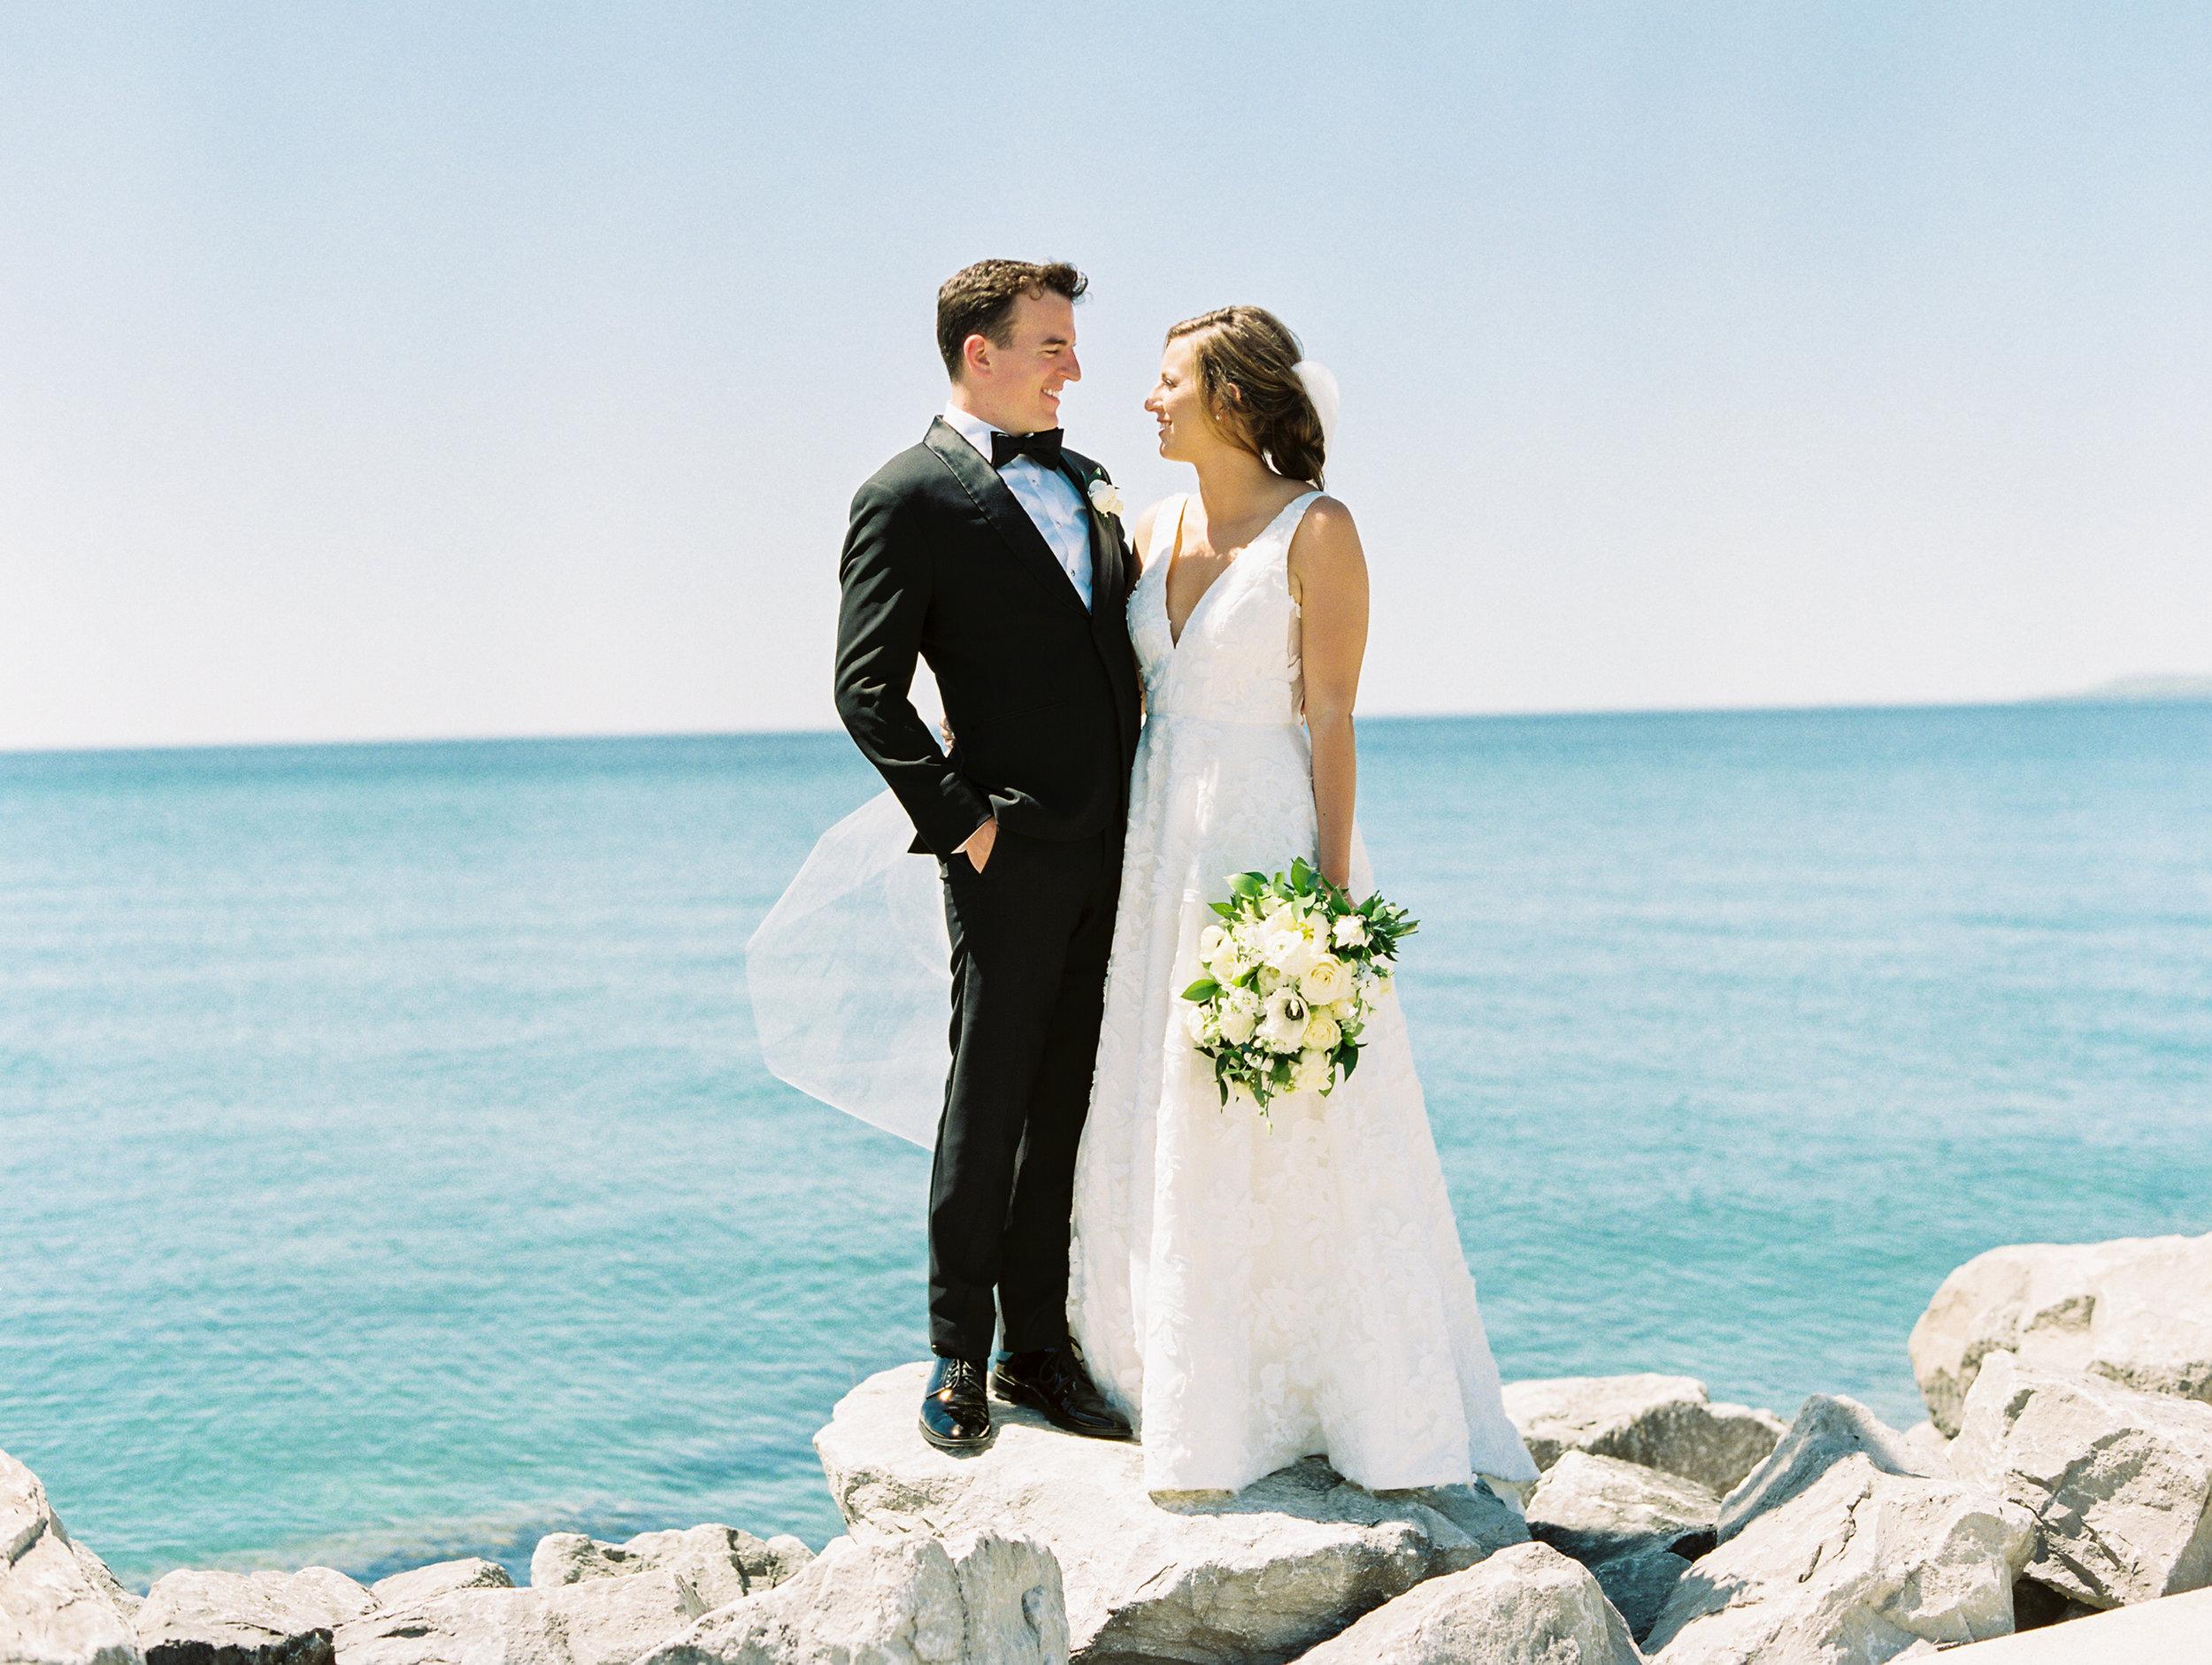 DeGuilio+Wedding+Bridal+Partyf-60.jpg